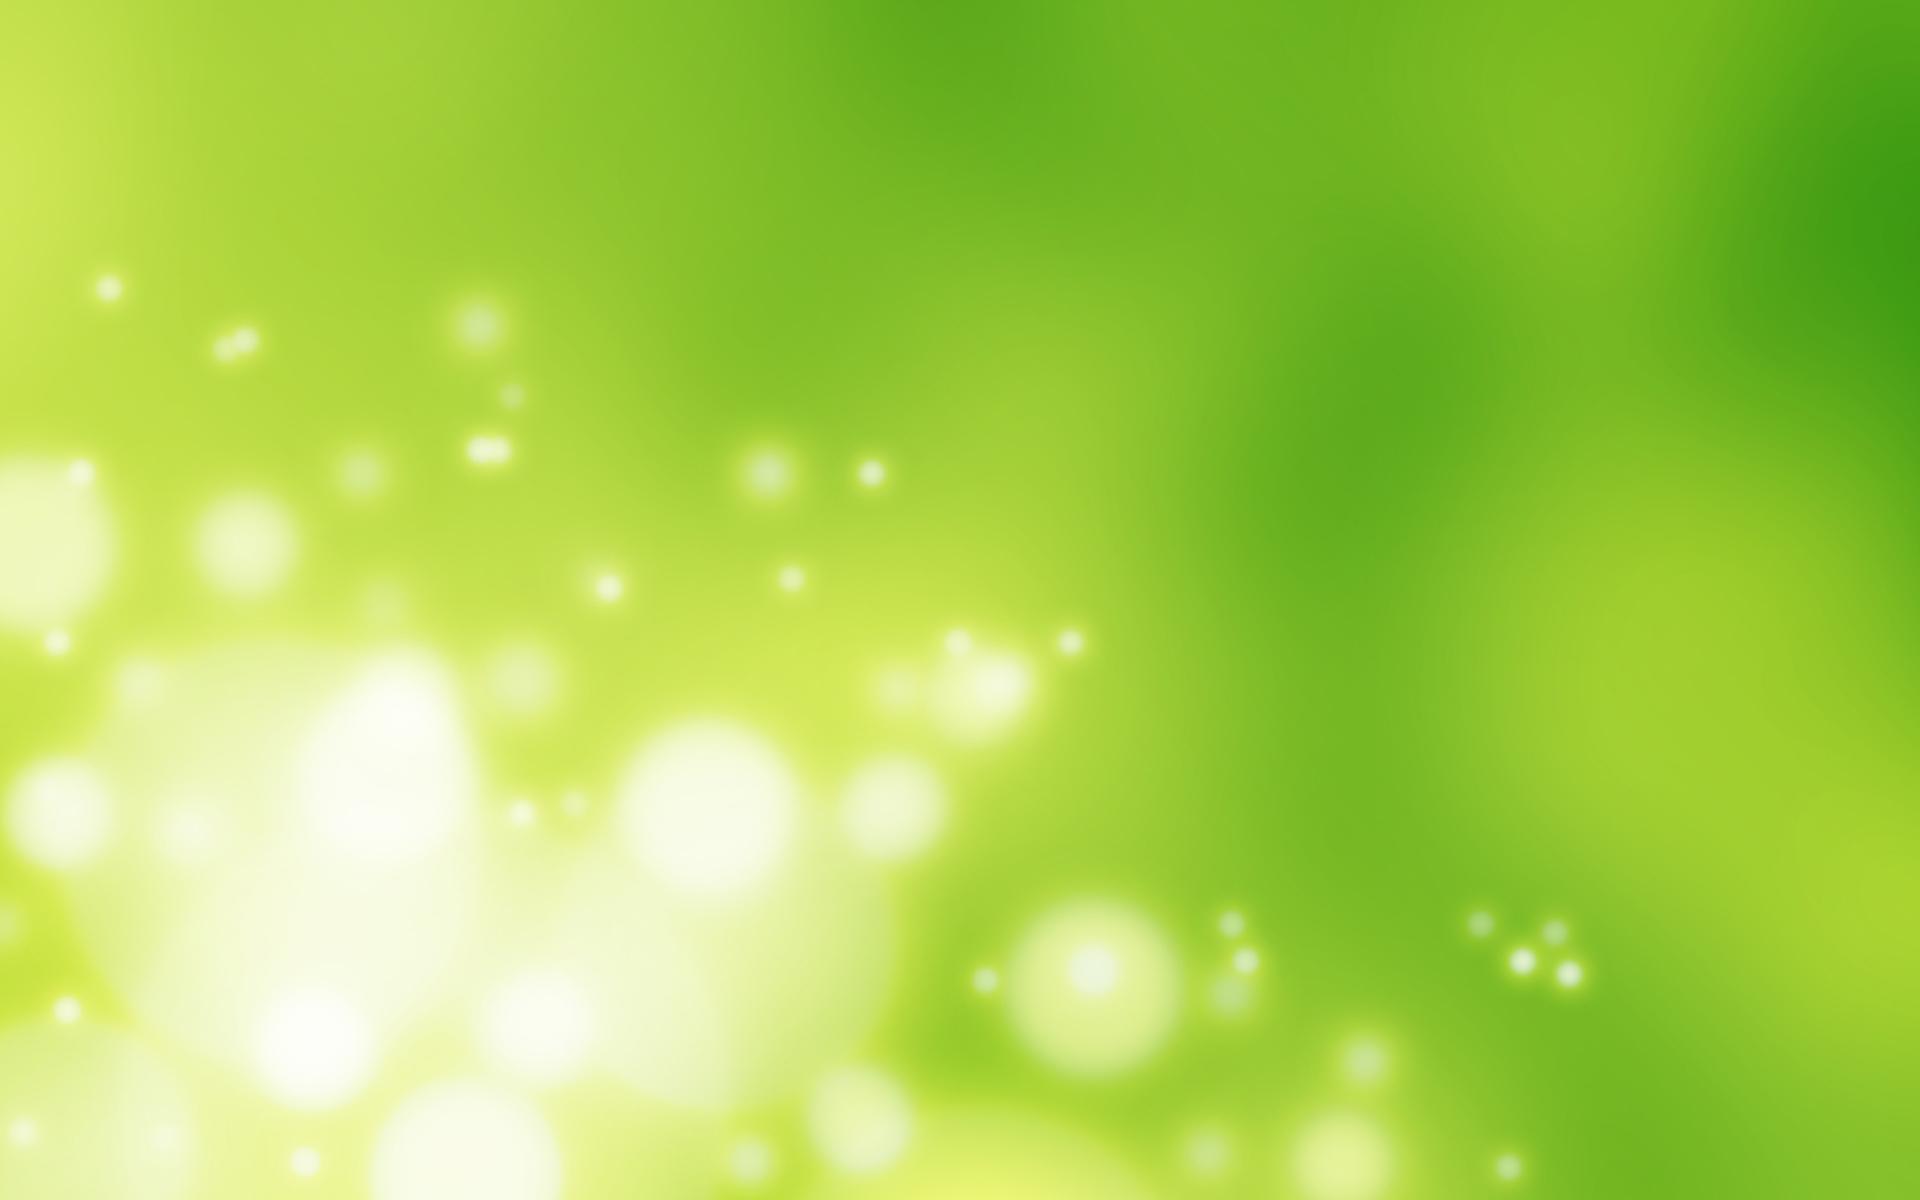 Пузыри абстракция текстура фон 1920x1200